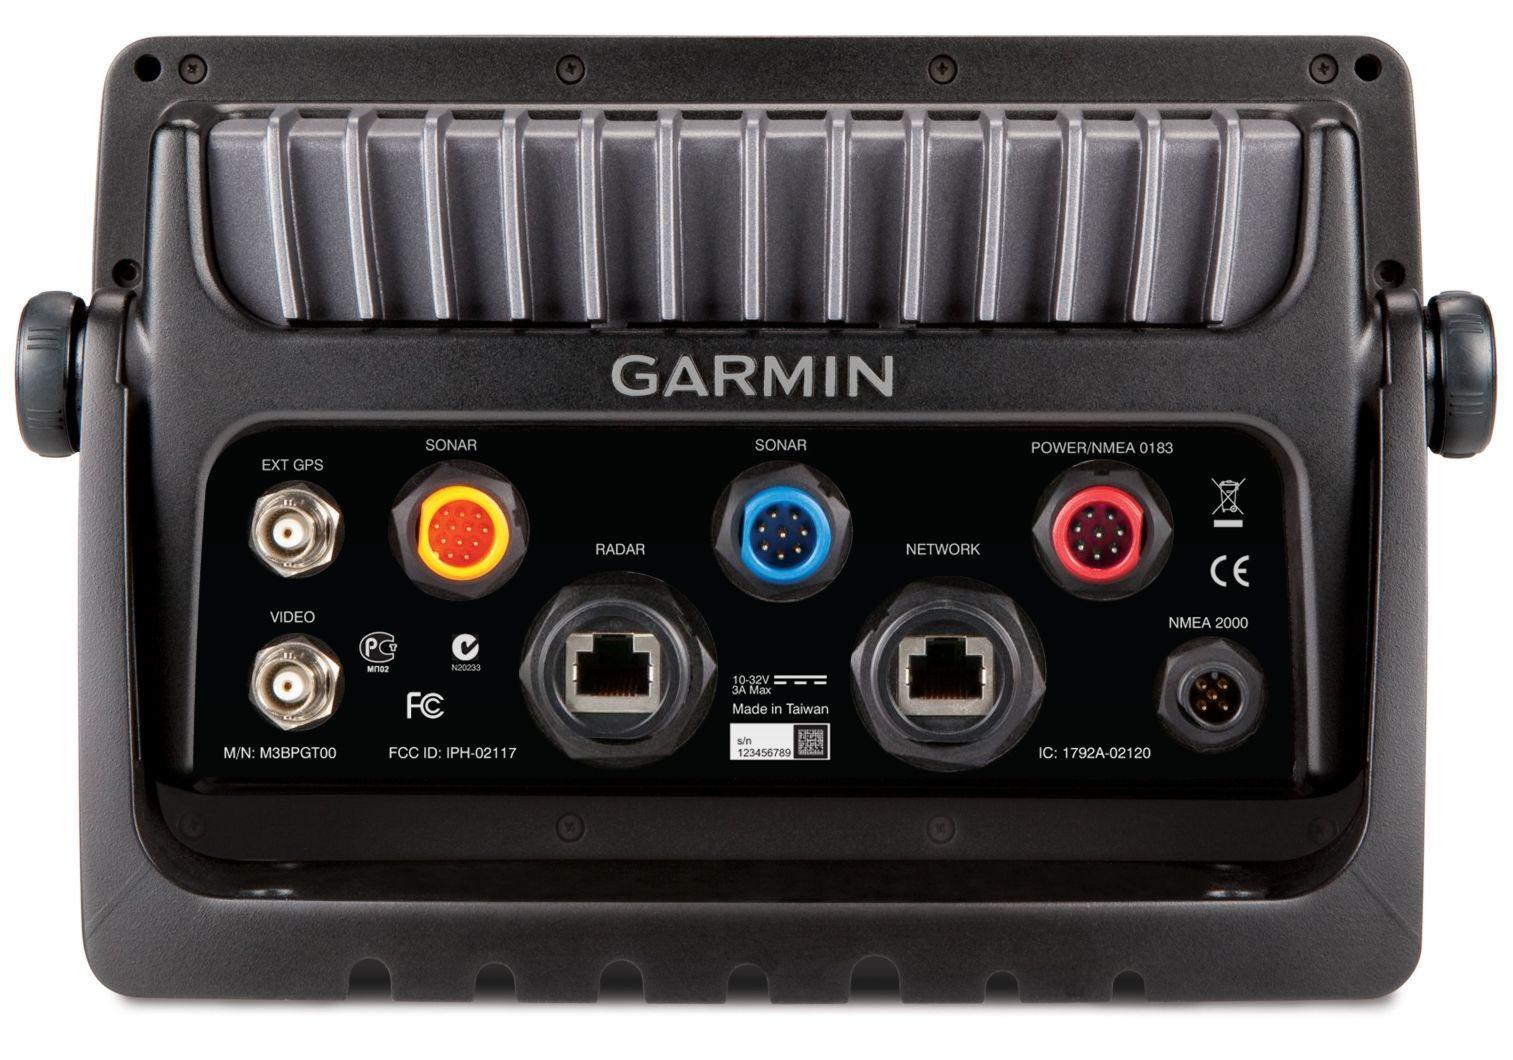 Garmin_7X1_rear_case_view_update_11 15 2012 panbo the marine electronics hub new garmin gpsmap 741sx, 741 Garmin 741 at eliteediting.co